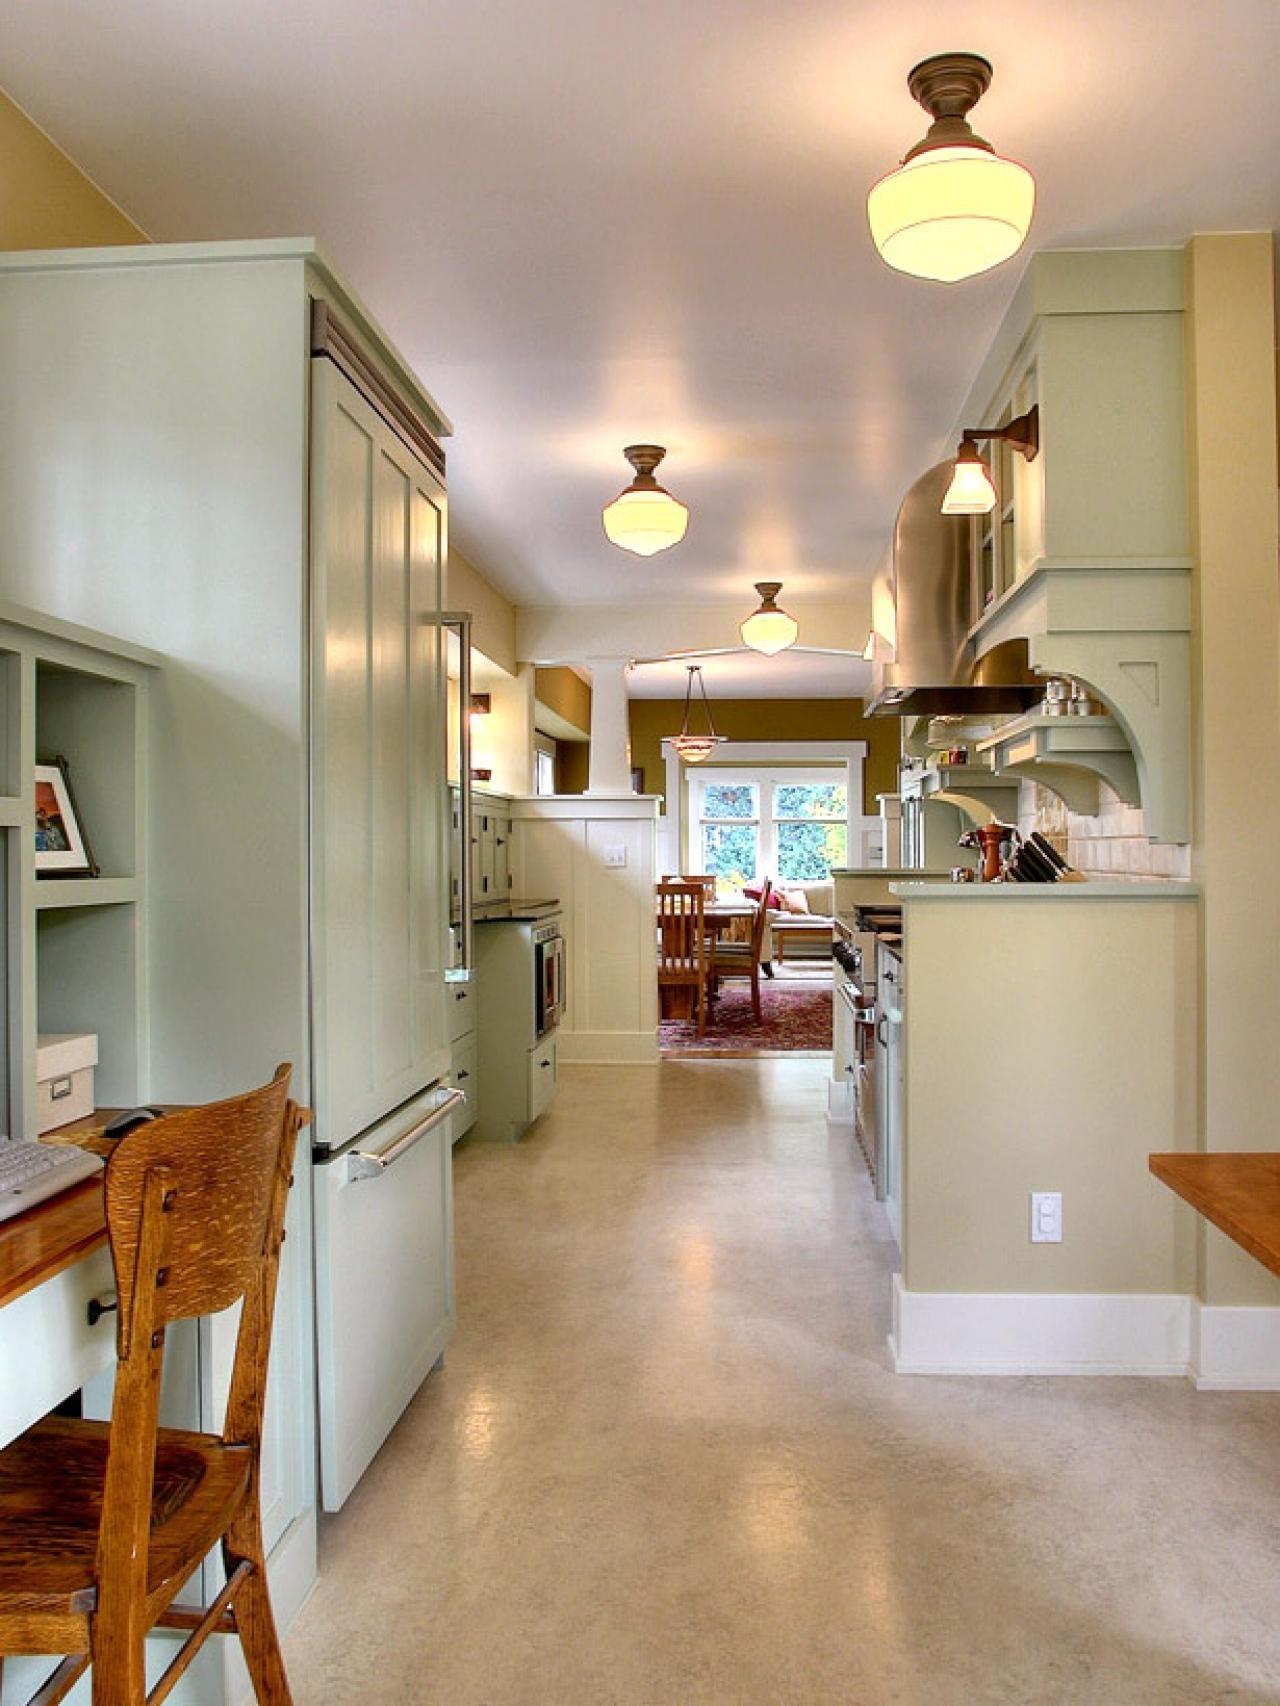 galley kitchen lighting ideas: pictures & ideas from hgtv | hgtv